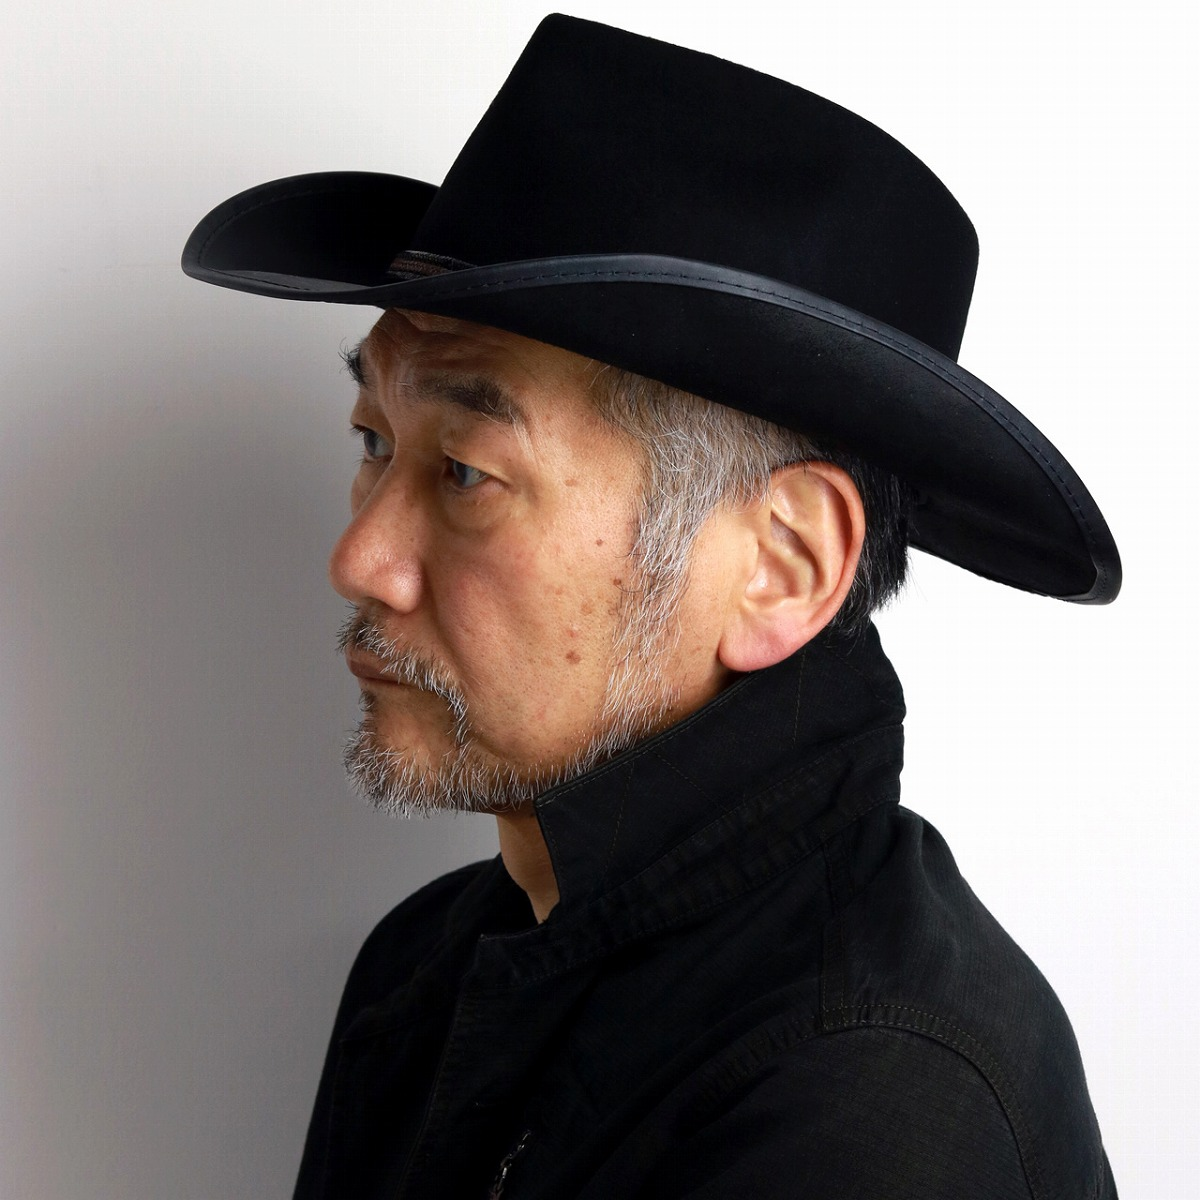 Leather hat lady s ten gallon individual big size ぼうし black black  cowboy  hat  man ... 4720a498c59